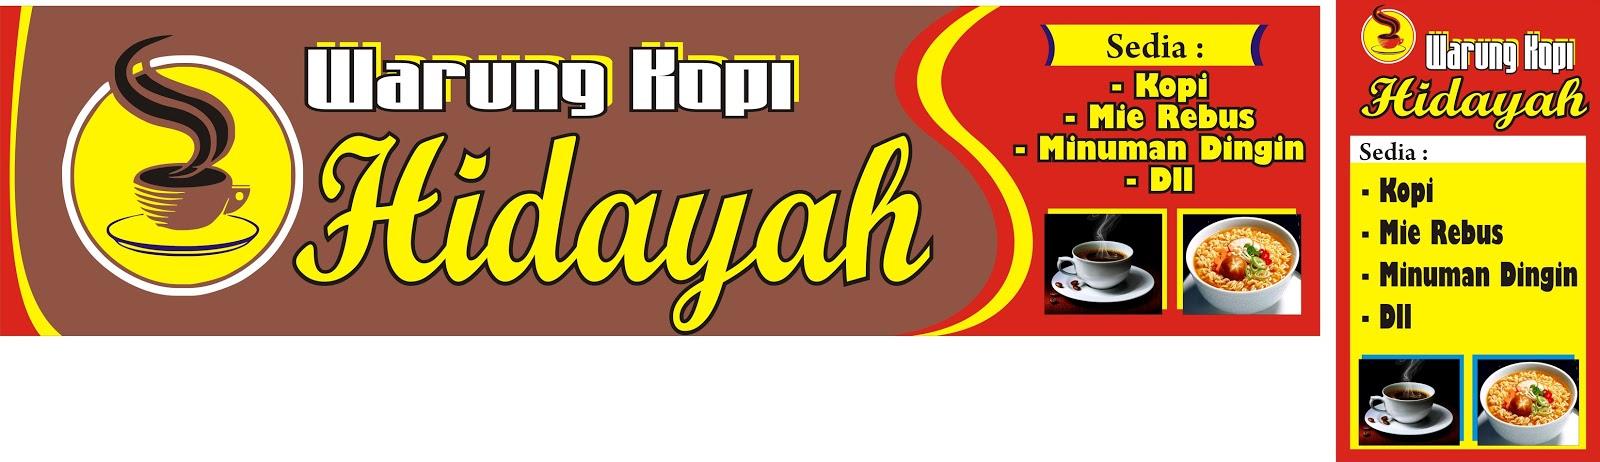 Banner Warung Kopi Cdr